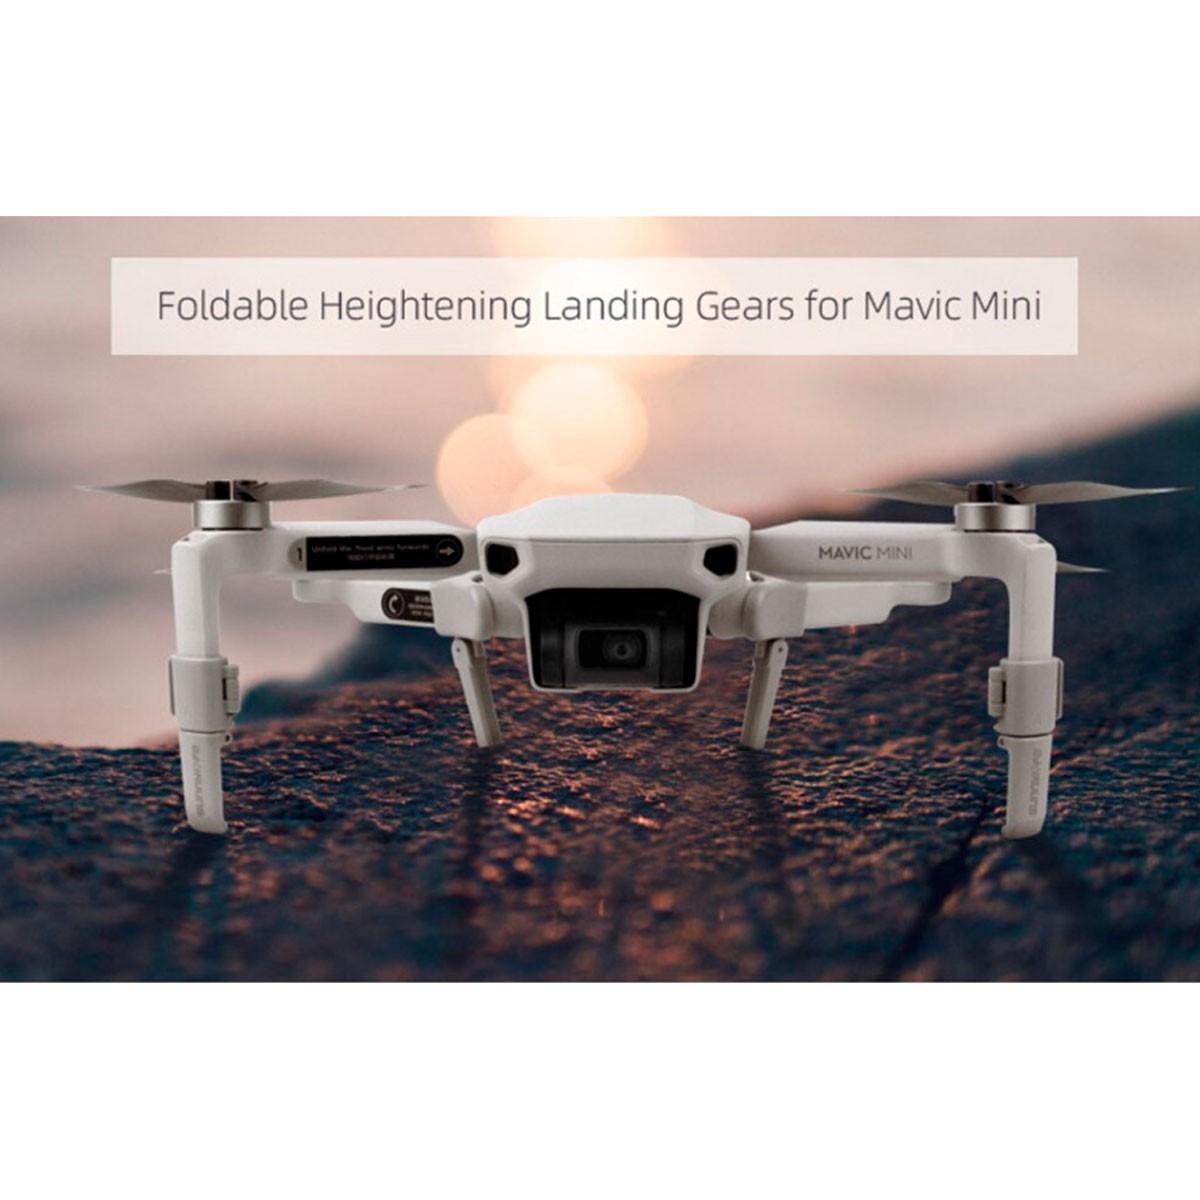 Extensor de Trem de Pouso - Drone DJI Mavic Mini